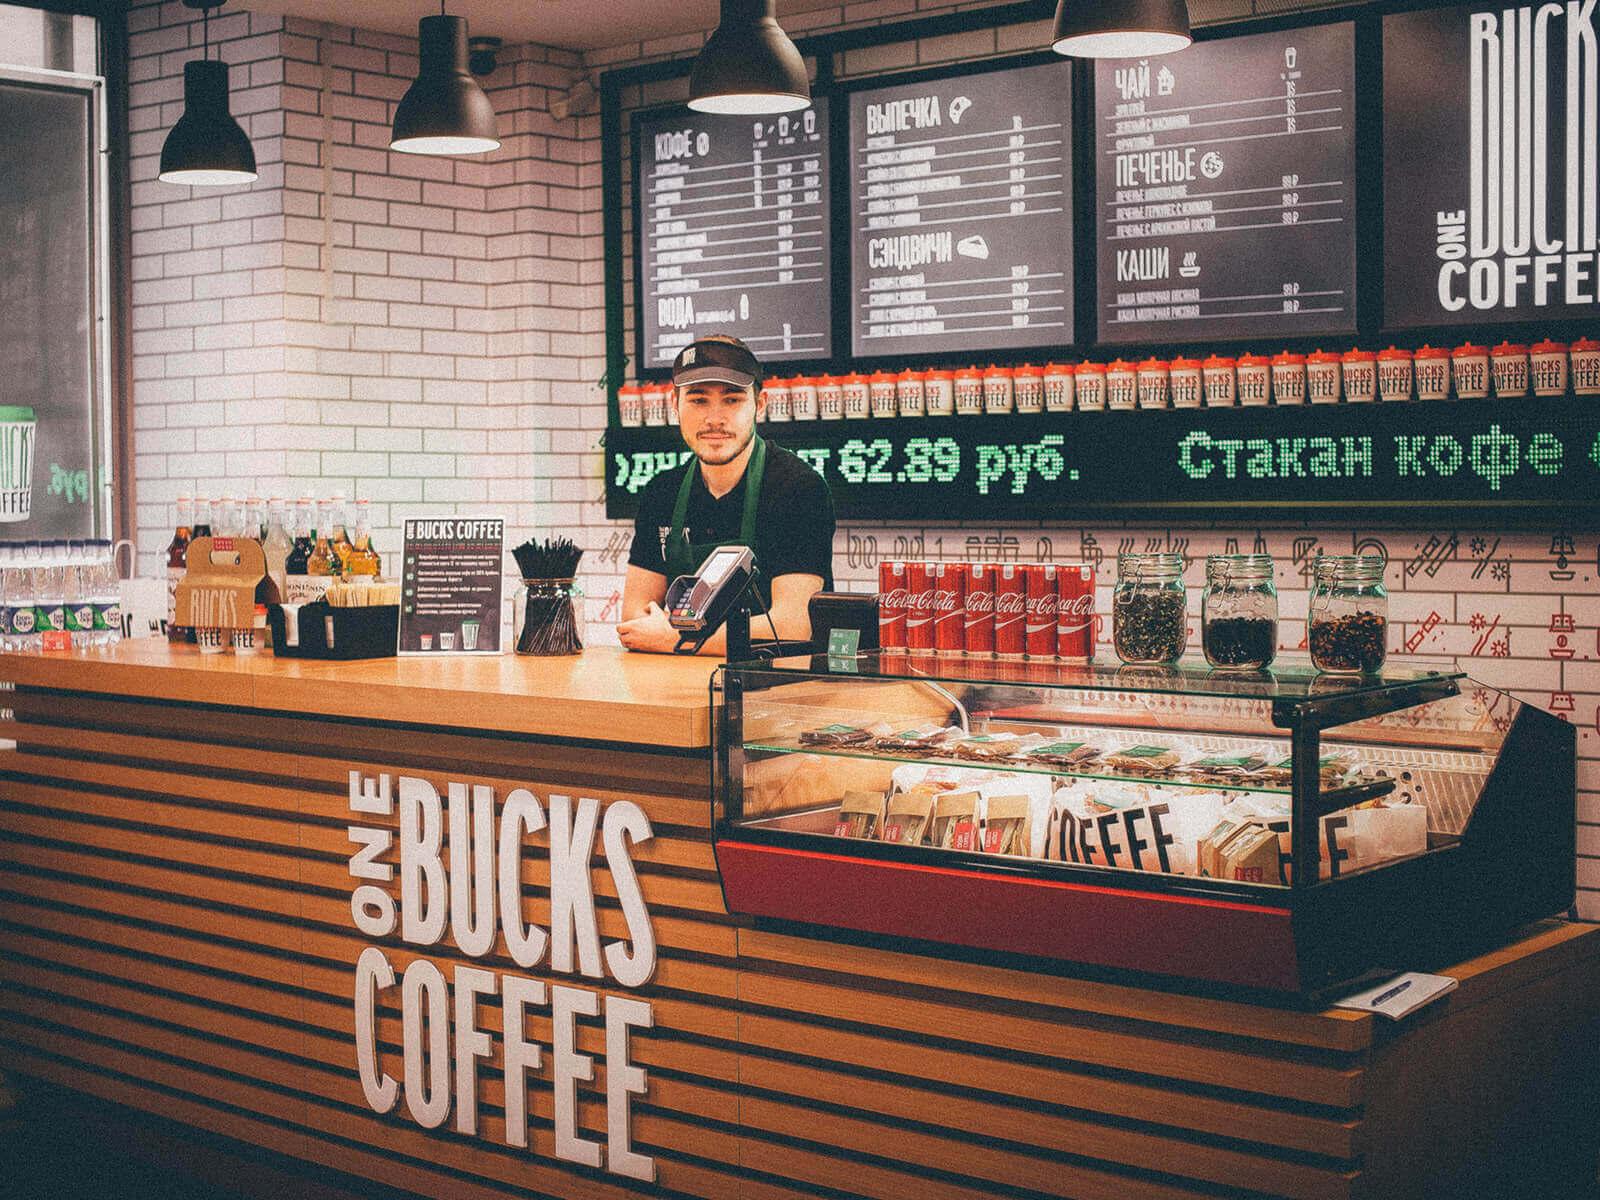 кофейня One Bucks Coffee